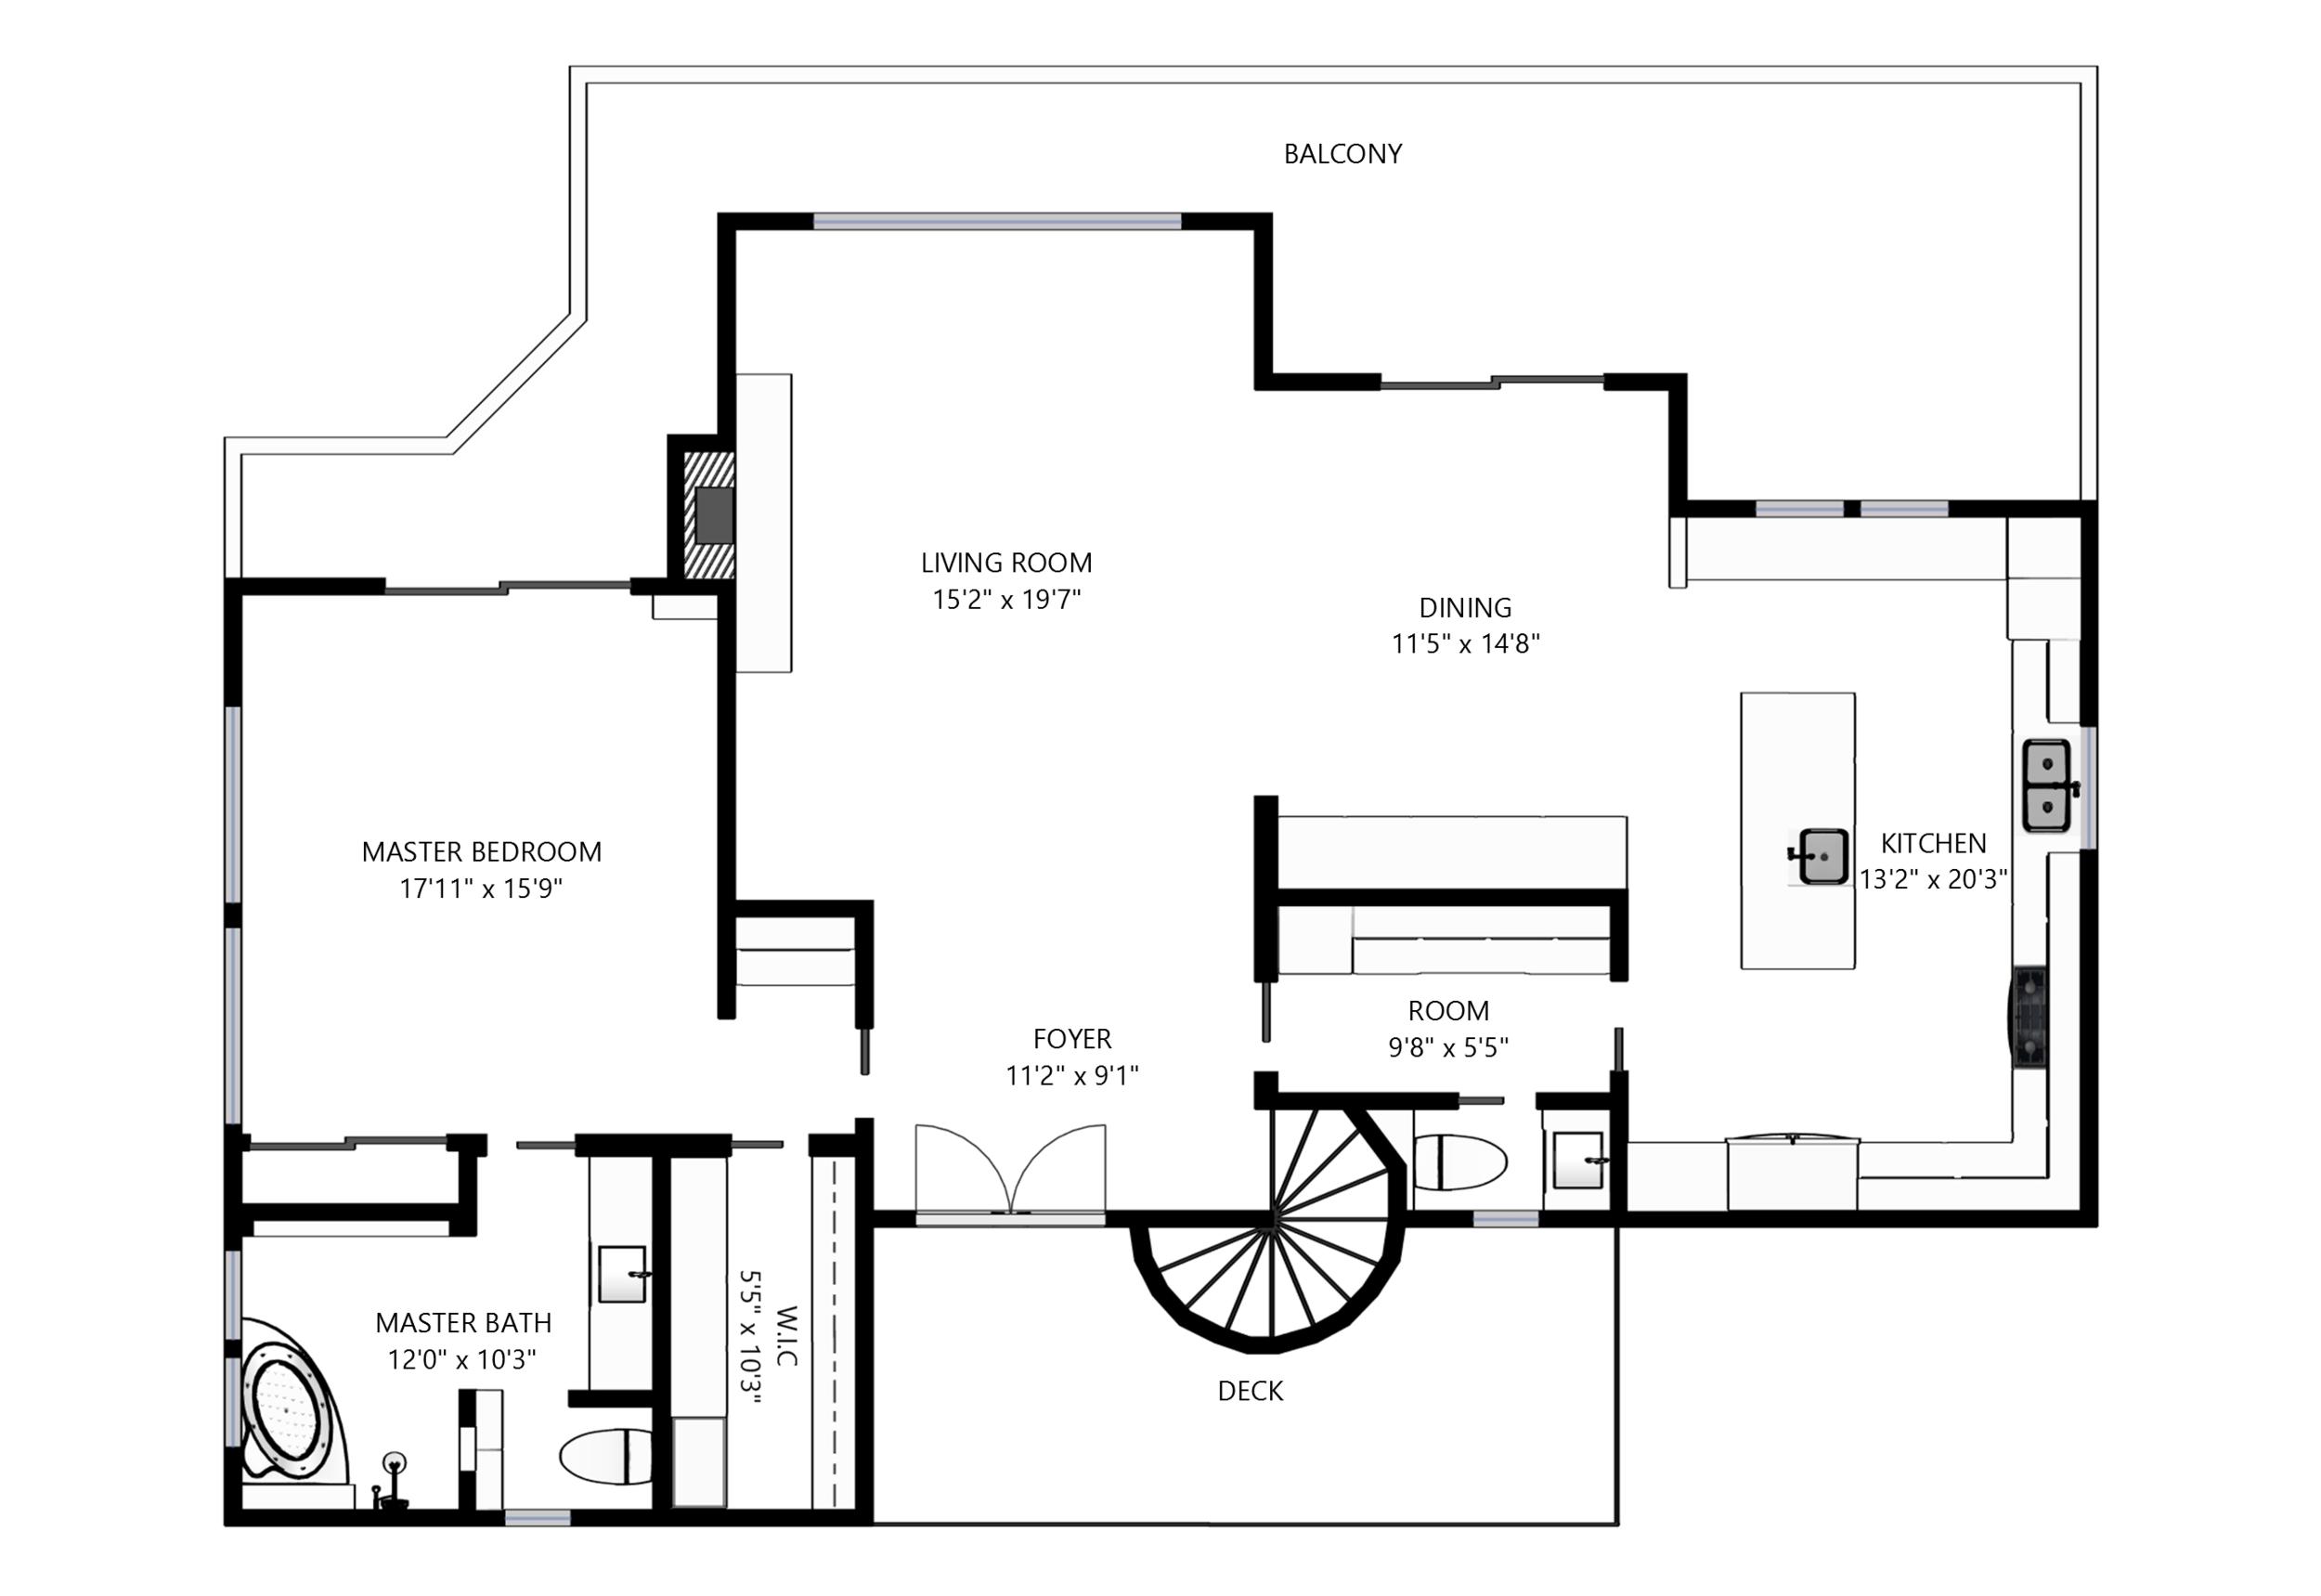 enviroscan3D | Capture real estate floor plans in 3D, as-built